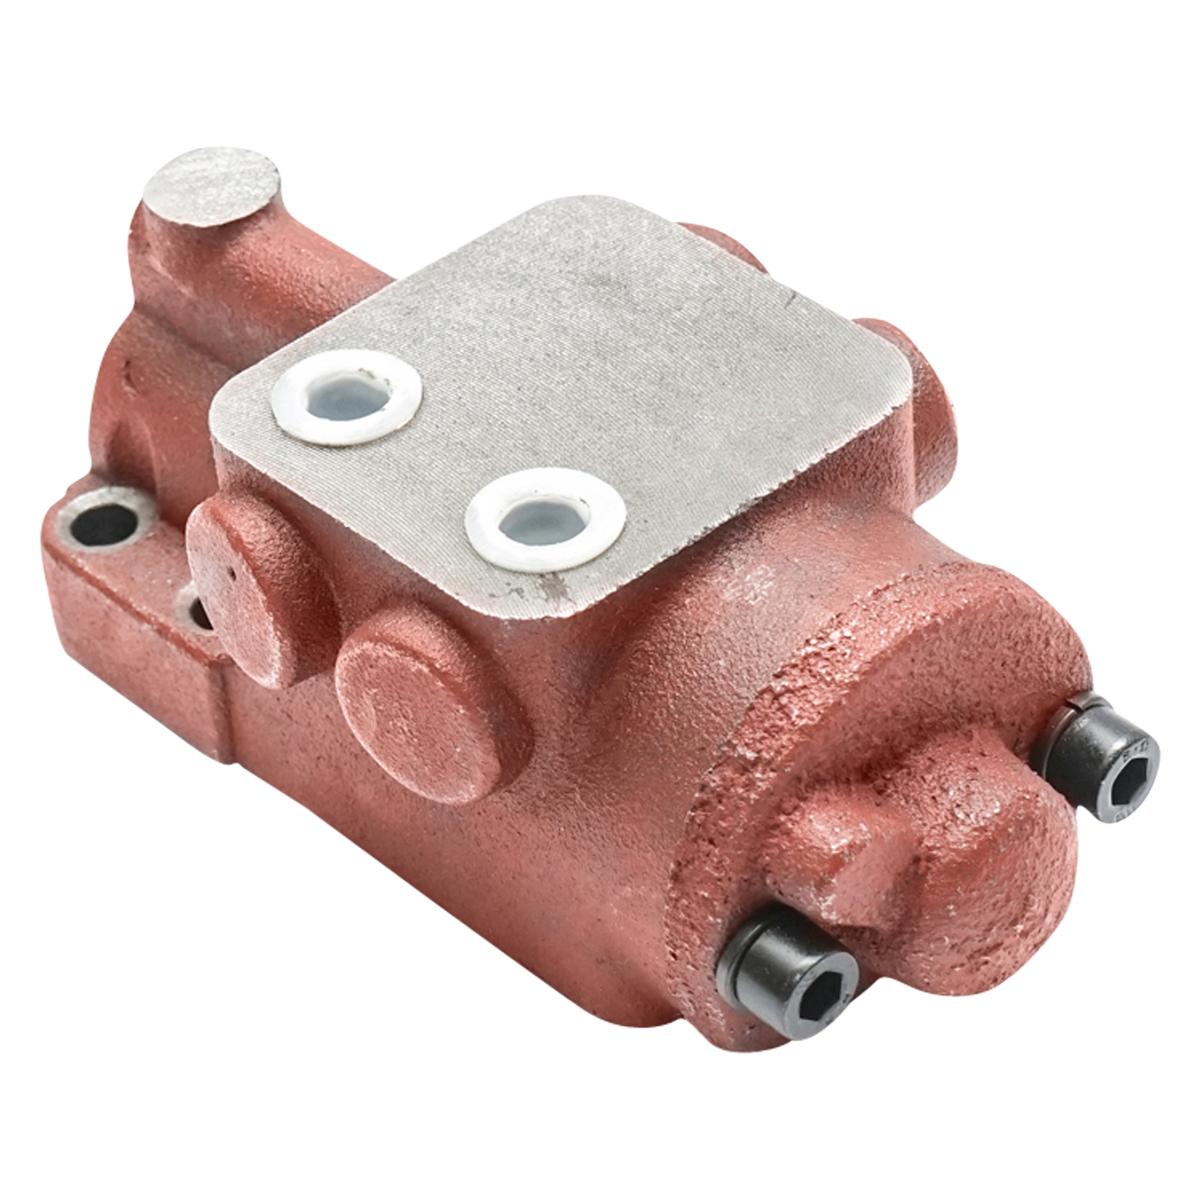 Distribuitor hidraulic servodirectie as. U-650 (sertaras)